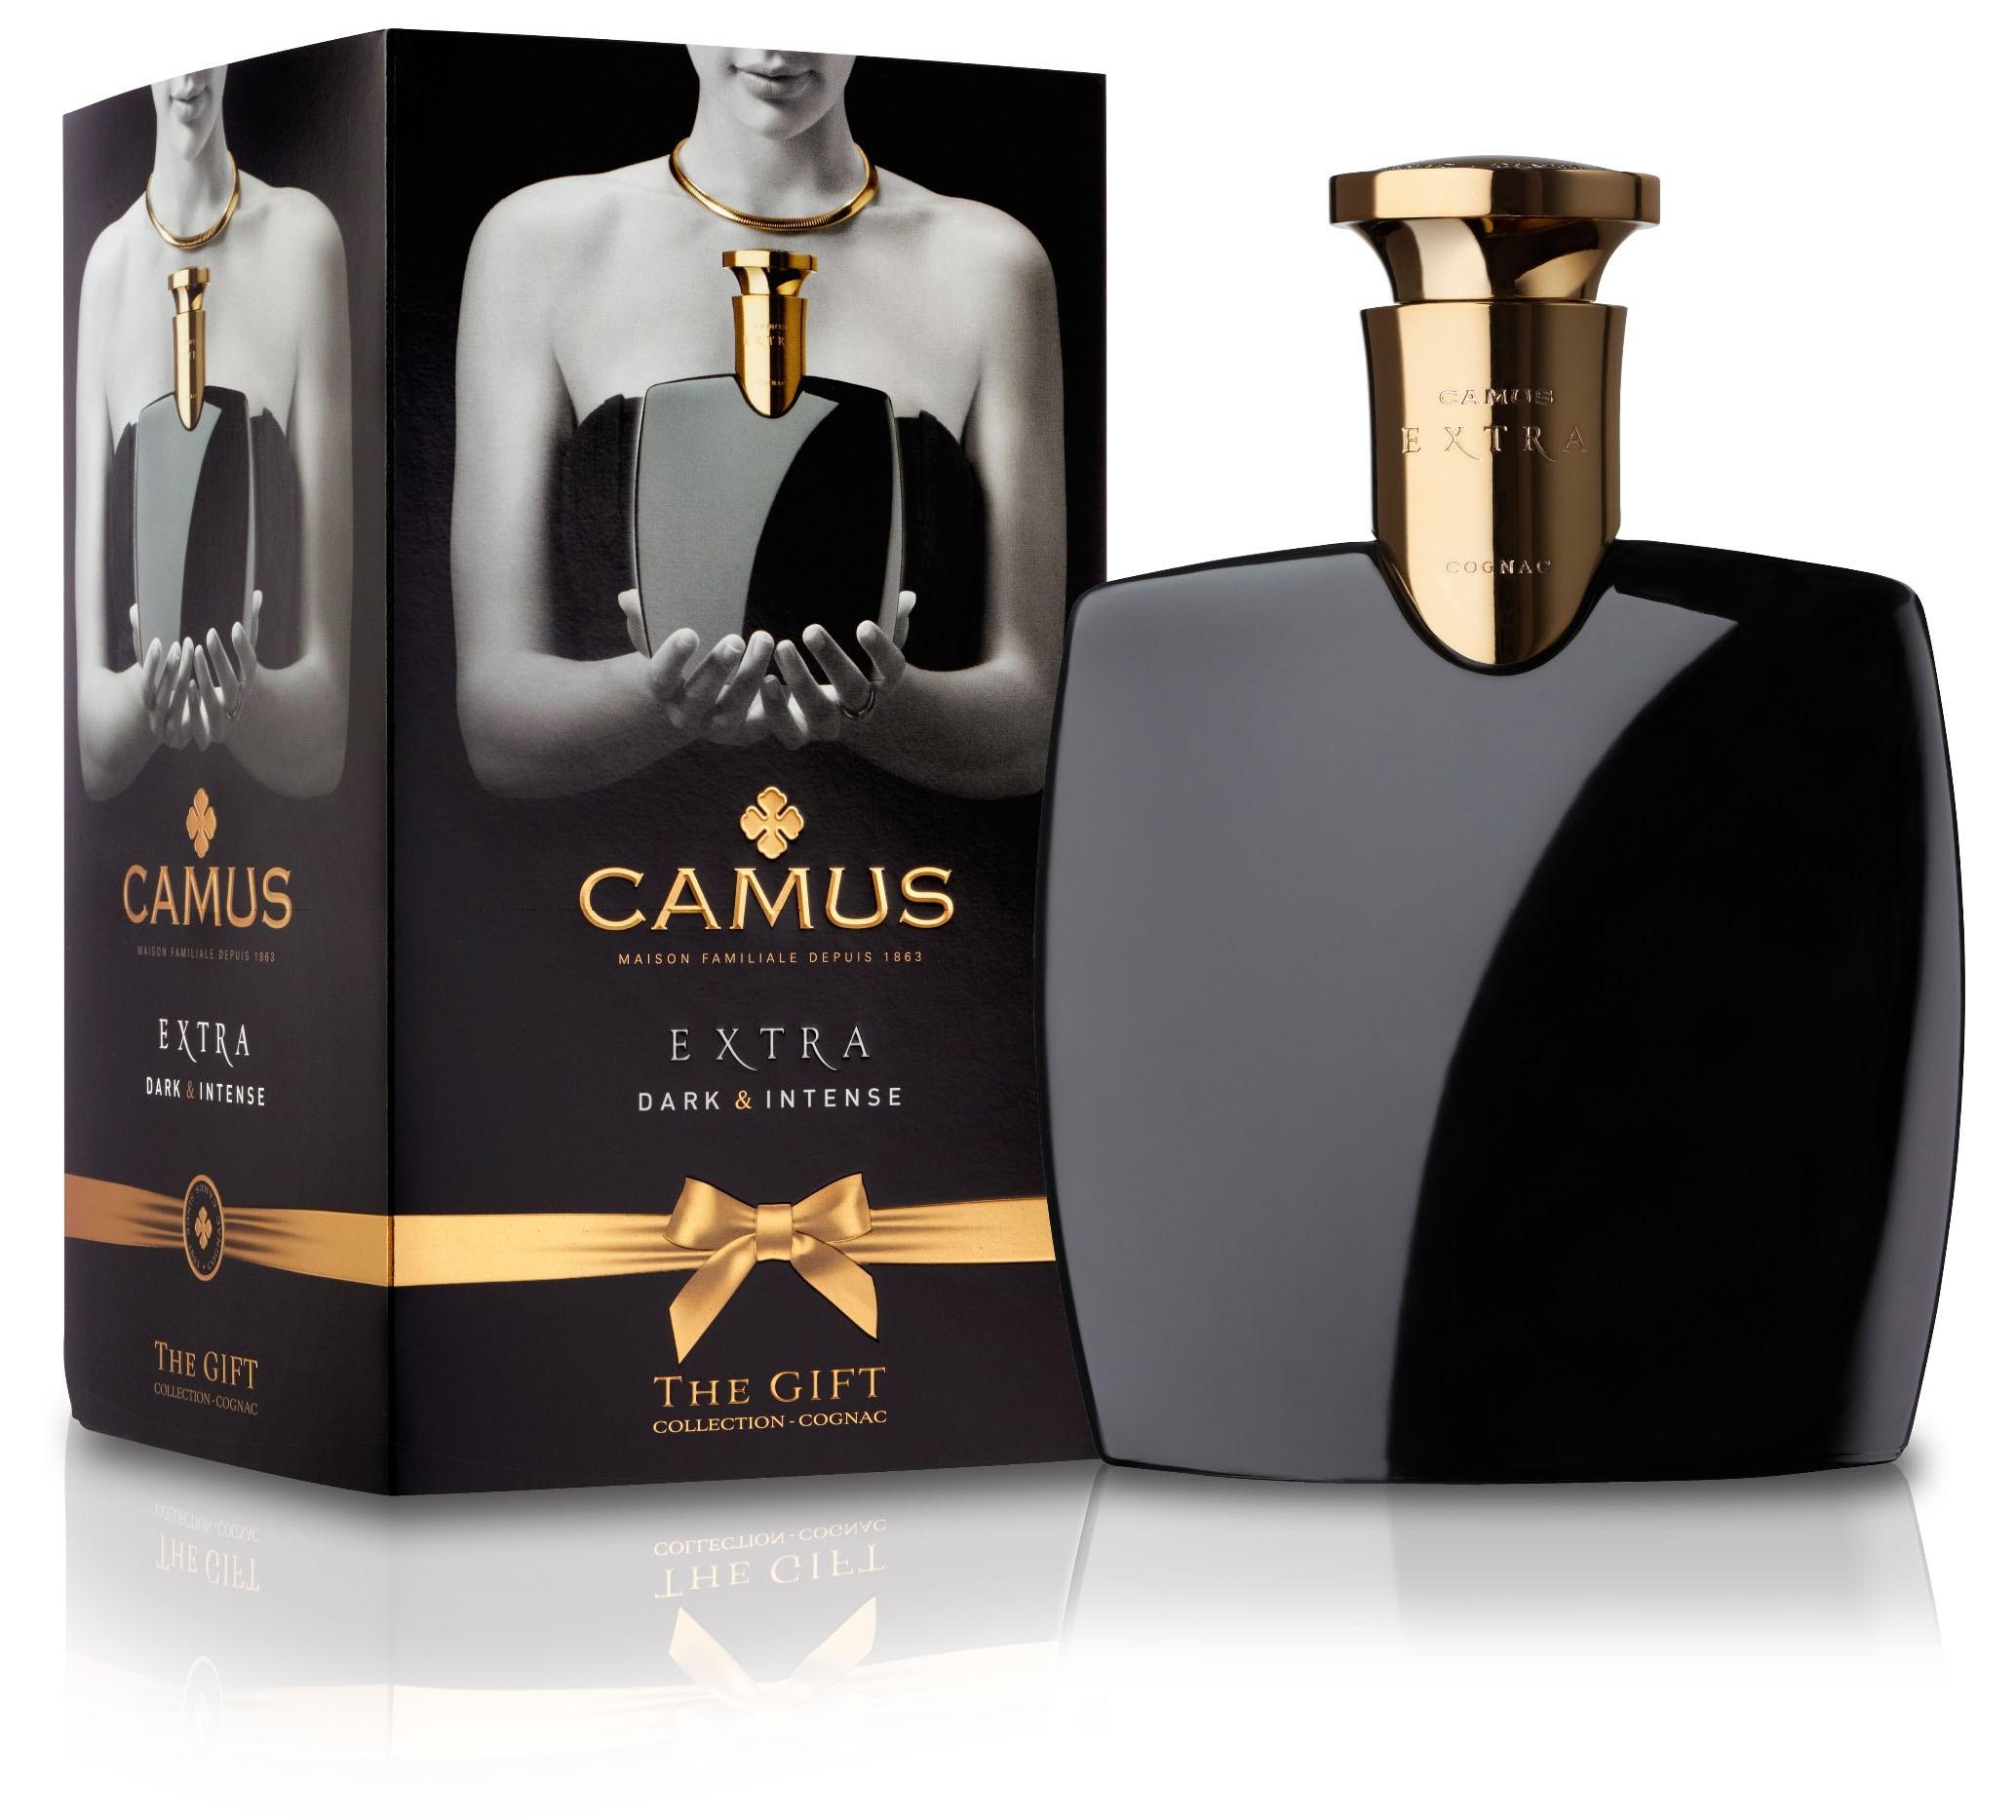 CAMUS EXTRA DARK&INTENSE 70CL